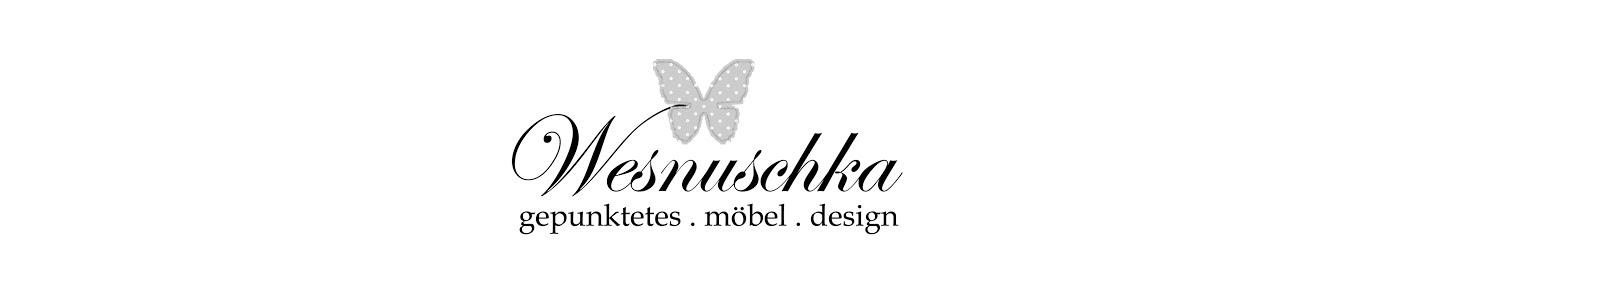 Wesnuschka